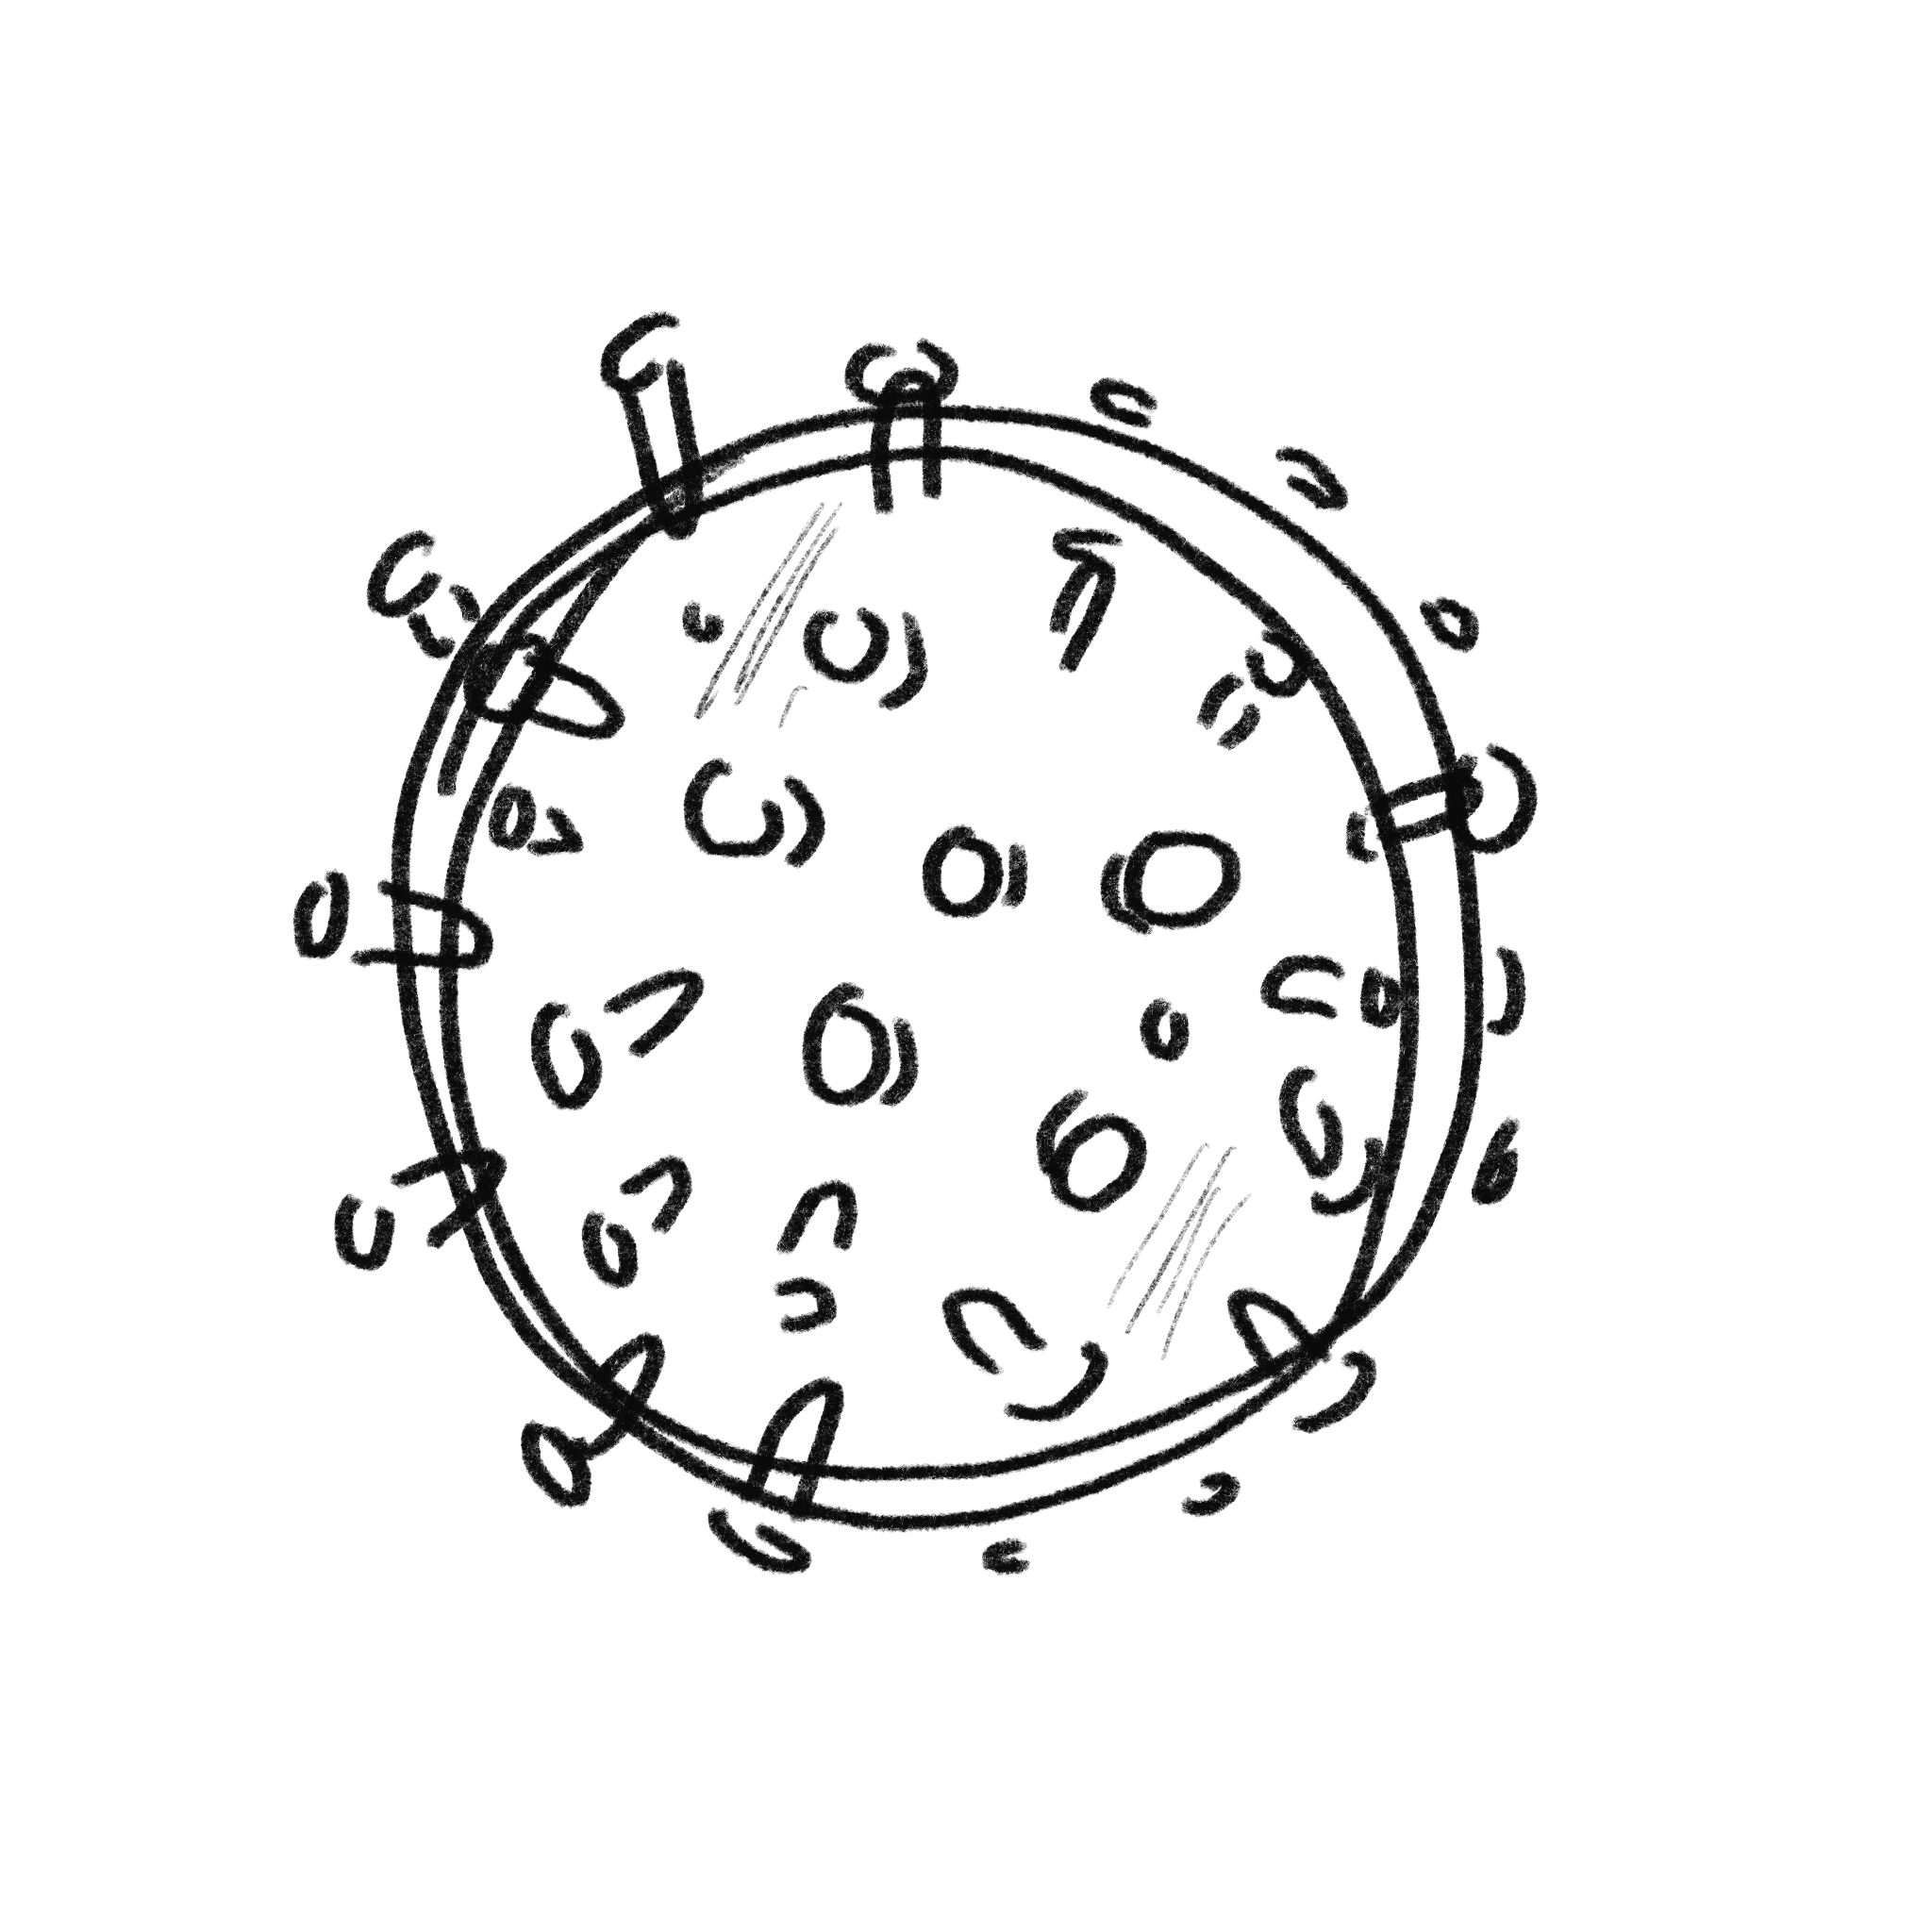 LATIMES-031920-spots_2-corona1